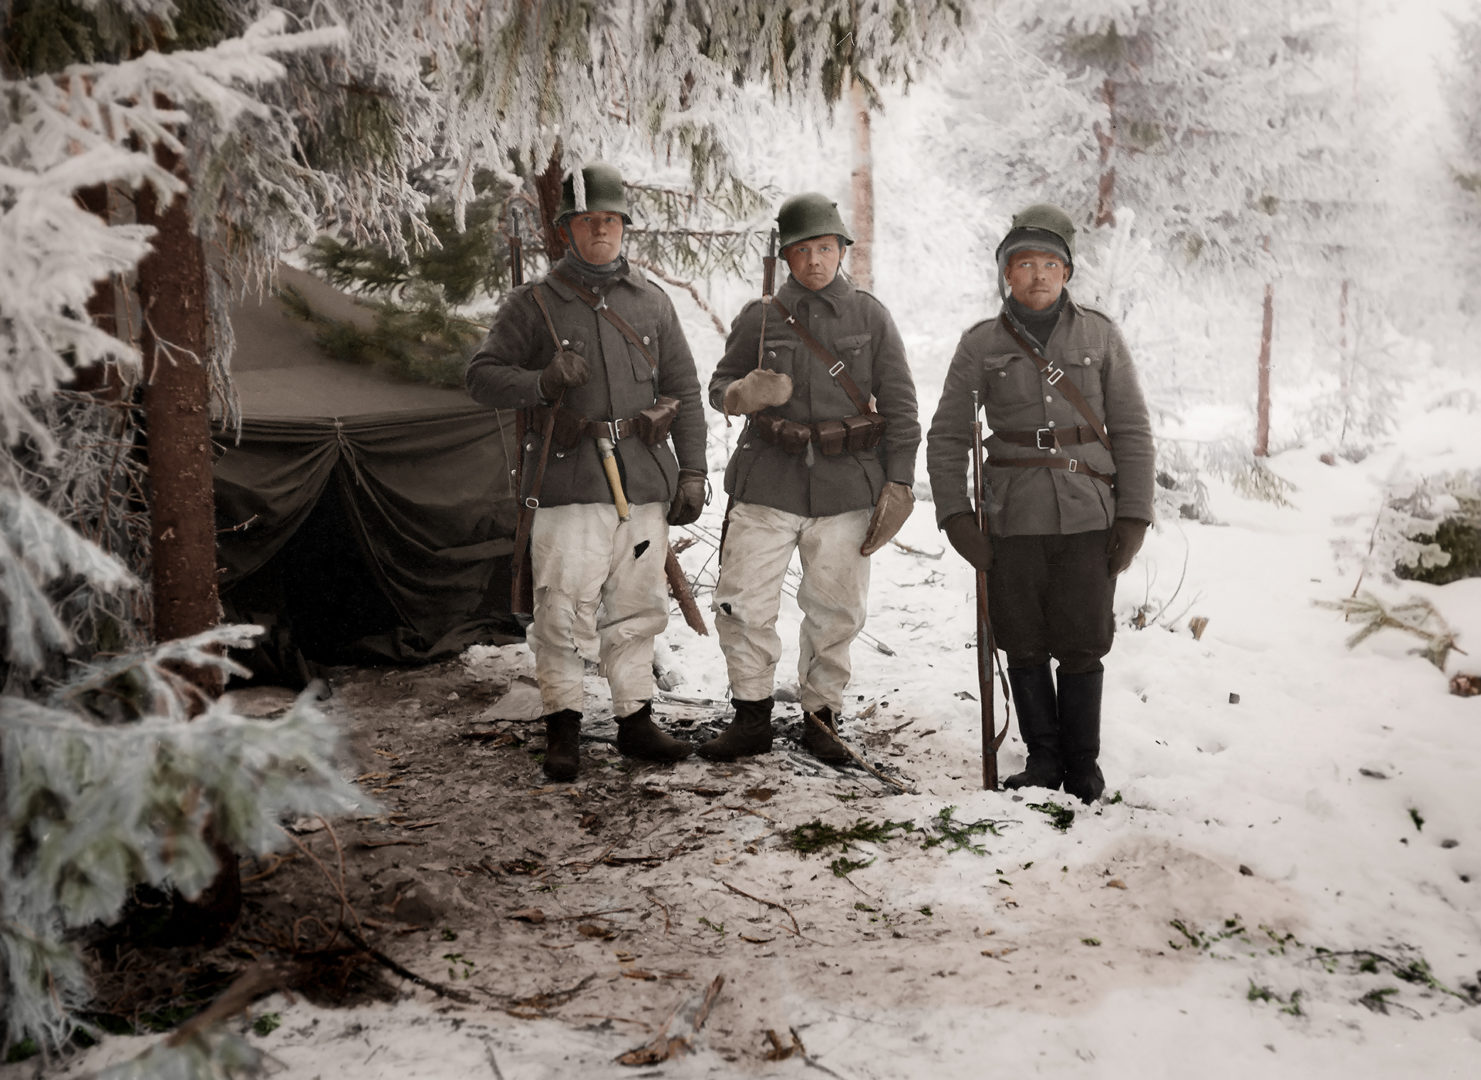 Sota-ajan kuvat